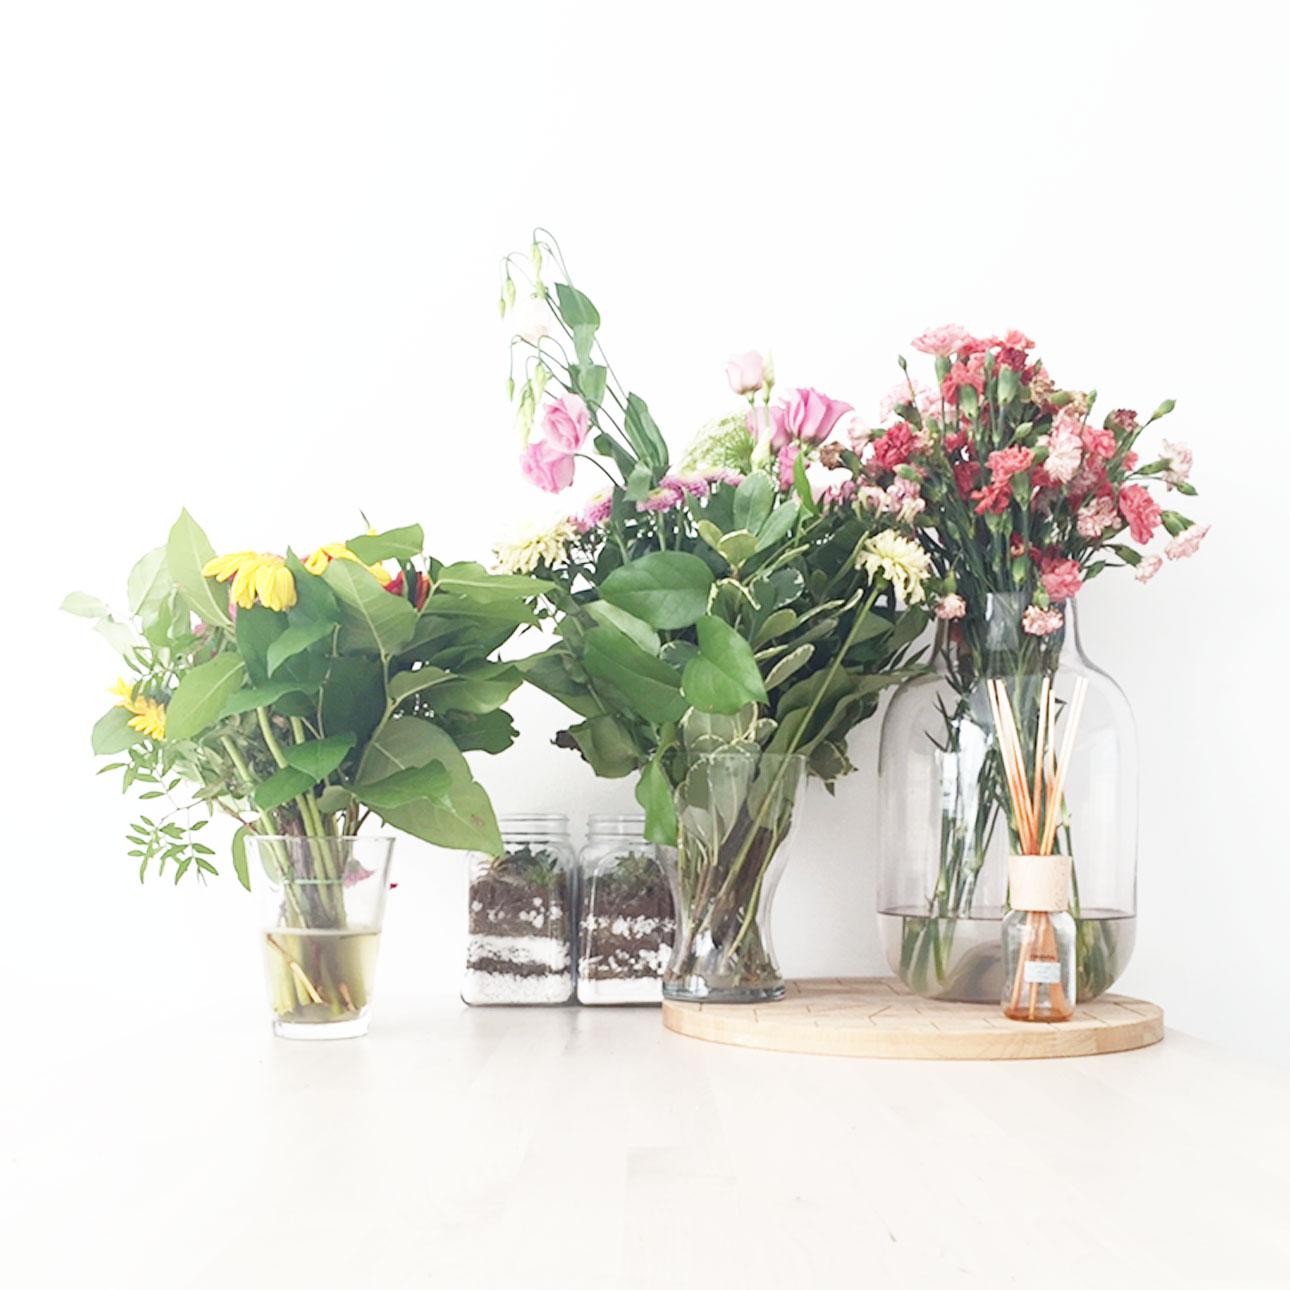 mamalifestyle augustus 2016 bloemen